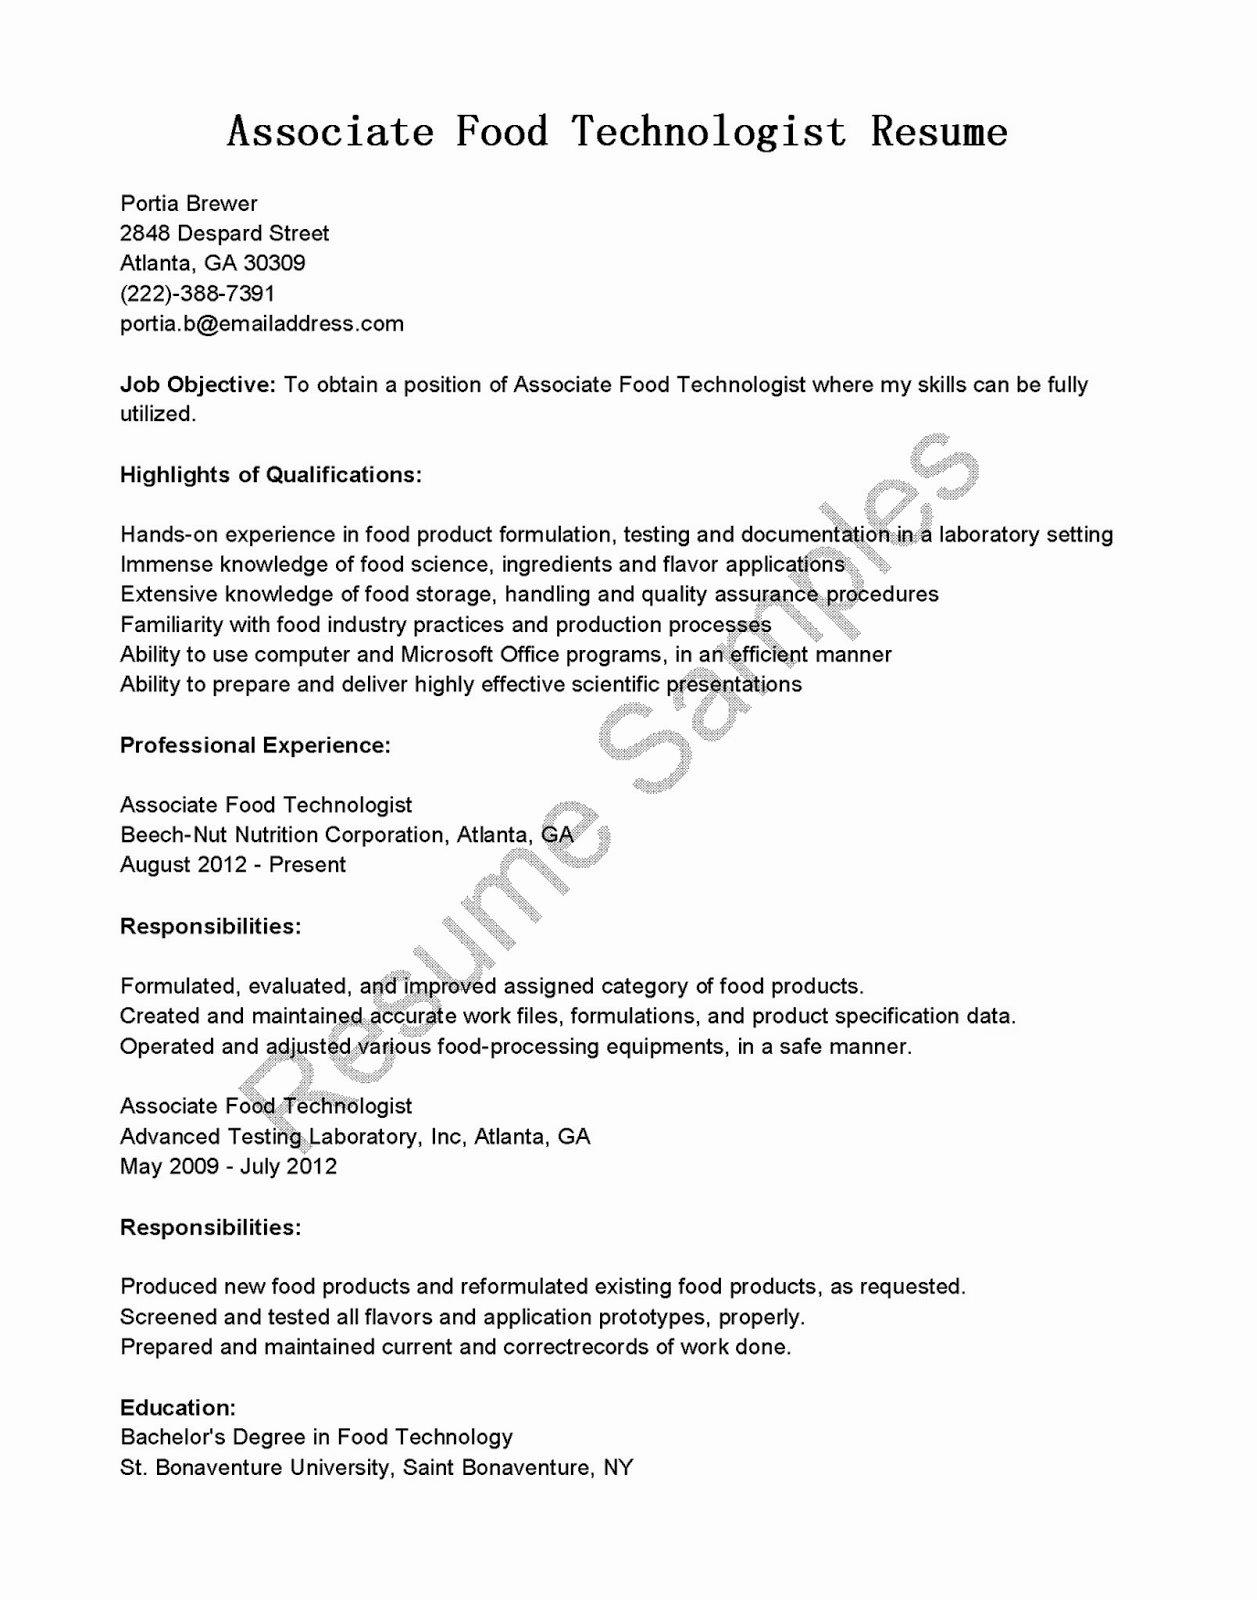 Resume Samples associate Food Technologist Resume Sample